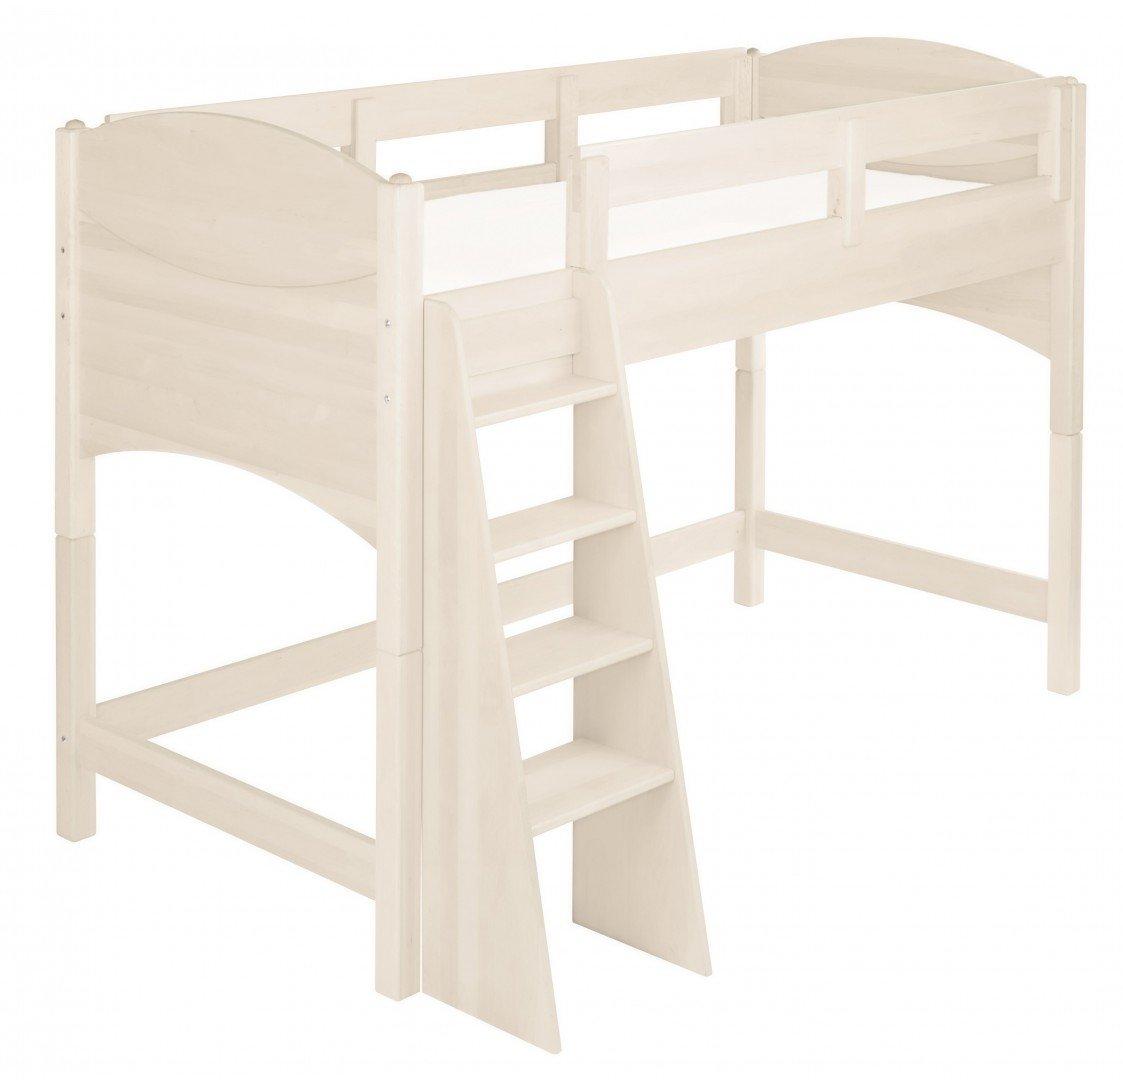 BioKinder 23875 Noah Spar-Set Kinder-Hochbett aus Massivholz Kiefer weiß 100 cm